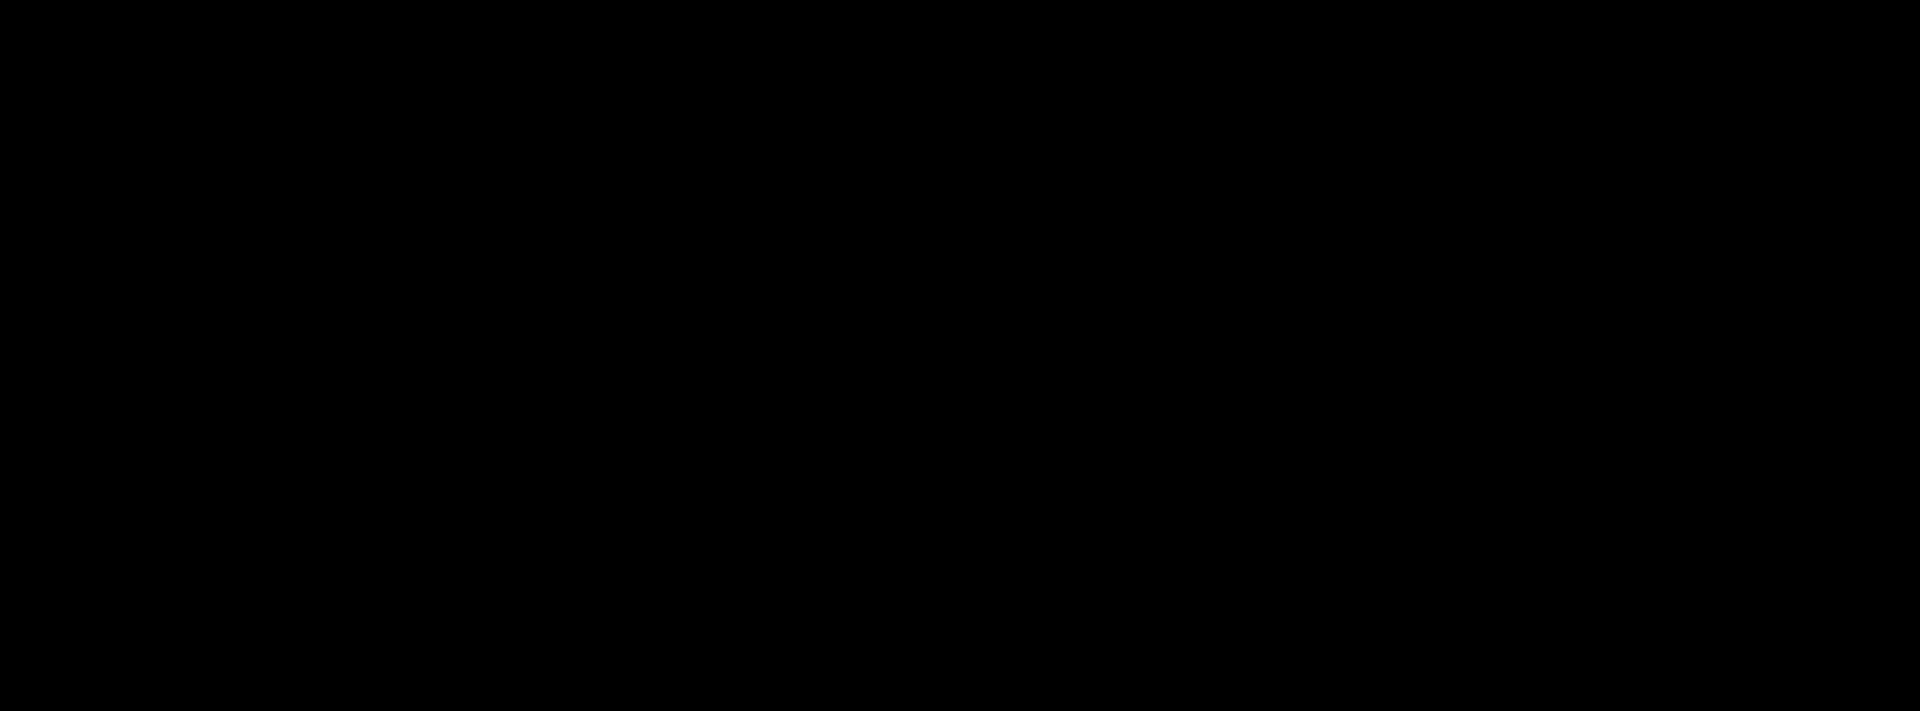 eggerre-hoved